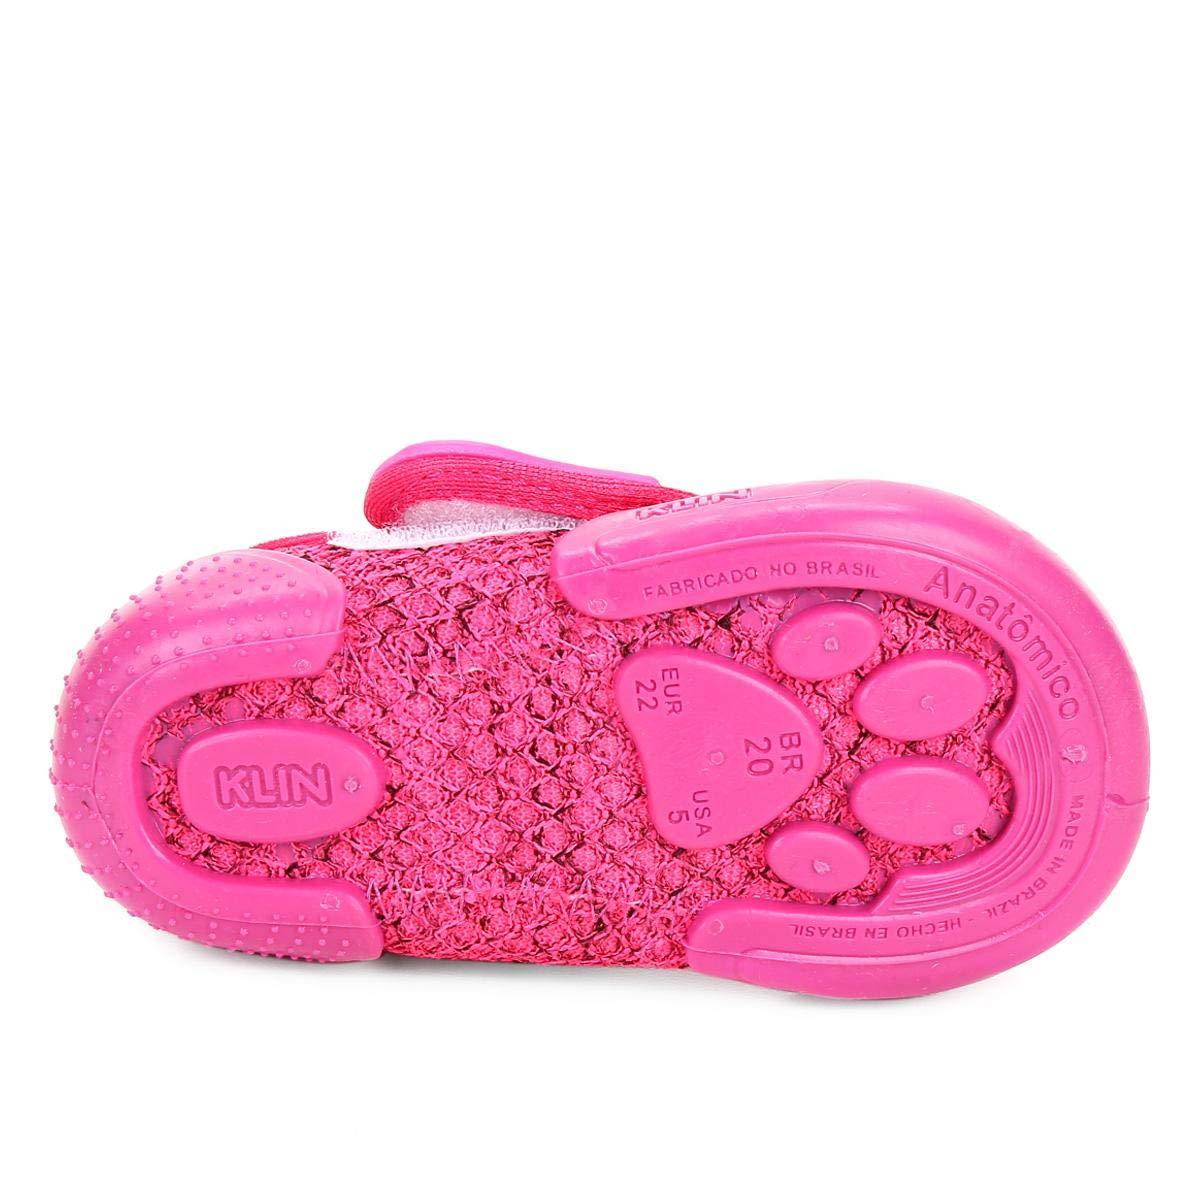 061c27f760 Tênis Infantil Klin New Confort Feminino  Amazon.com.br  Amazon Moda